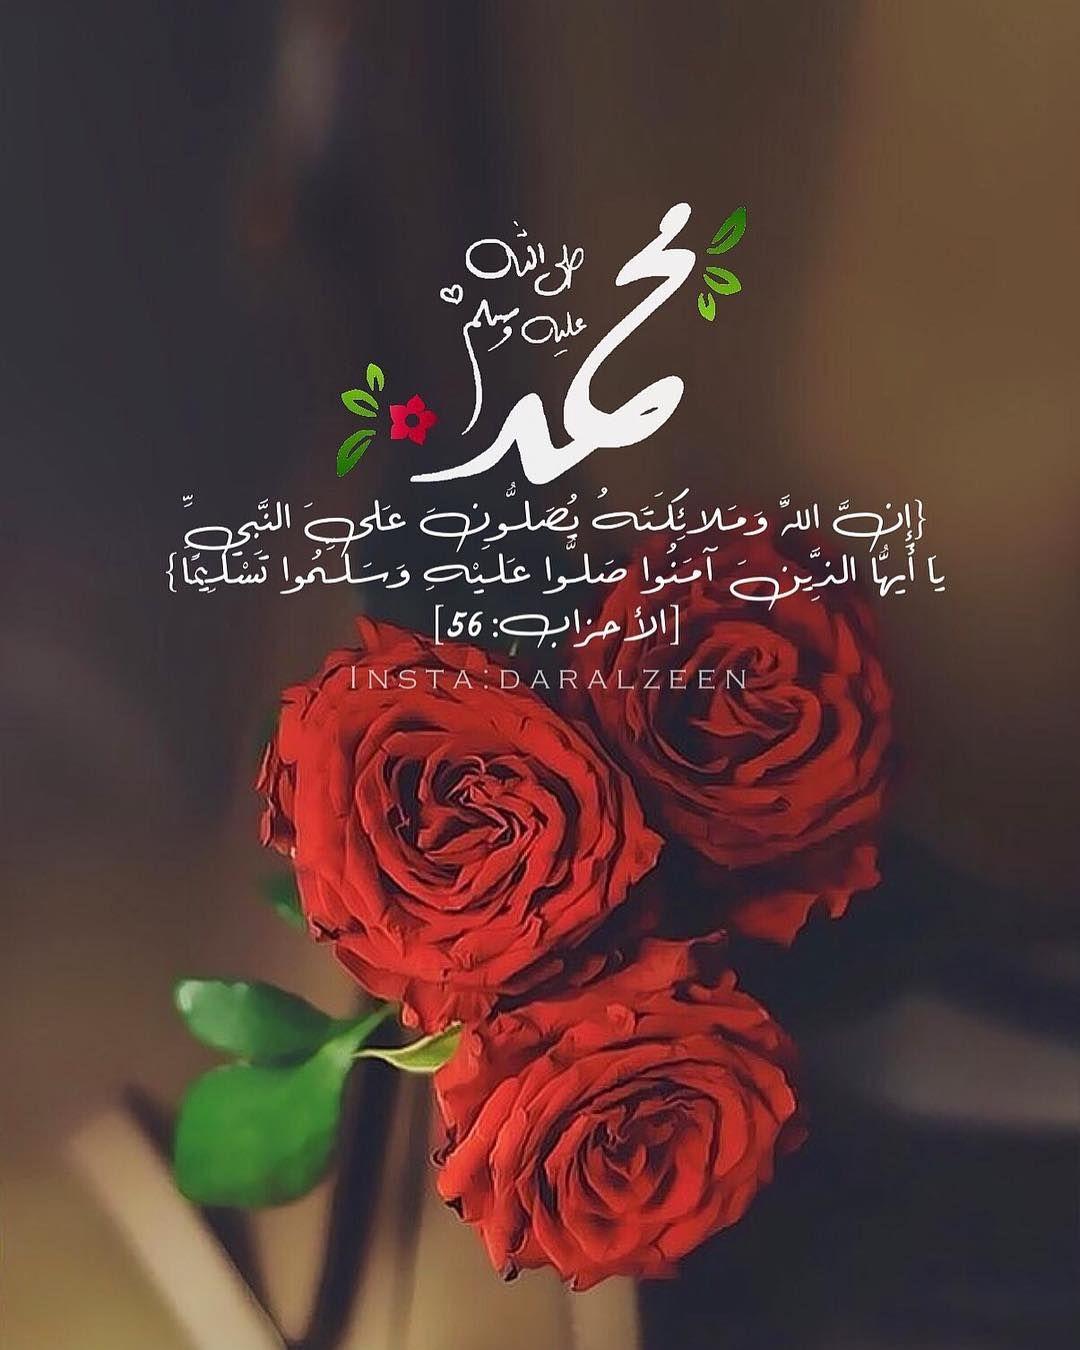 Pin By Ldisee Monarcho On اللهم صل على سيدنا محمد وعلى آله وصحبه وسلم Ahadith Islamic Teachings Islamic Images